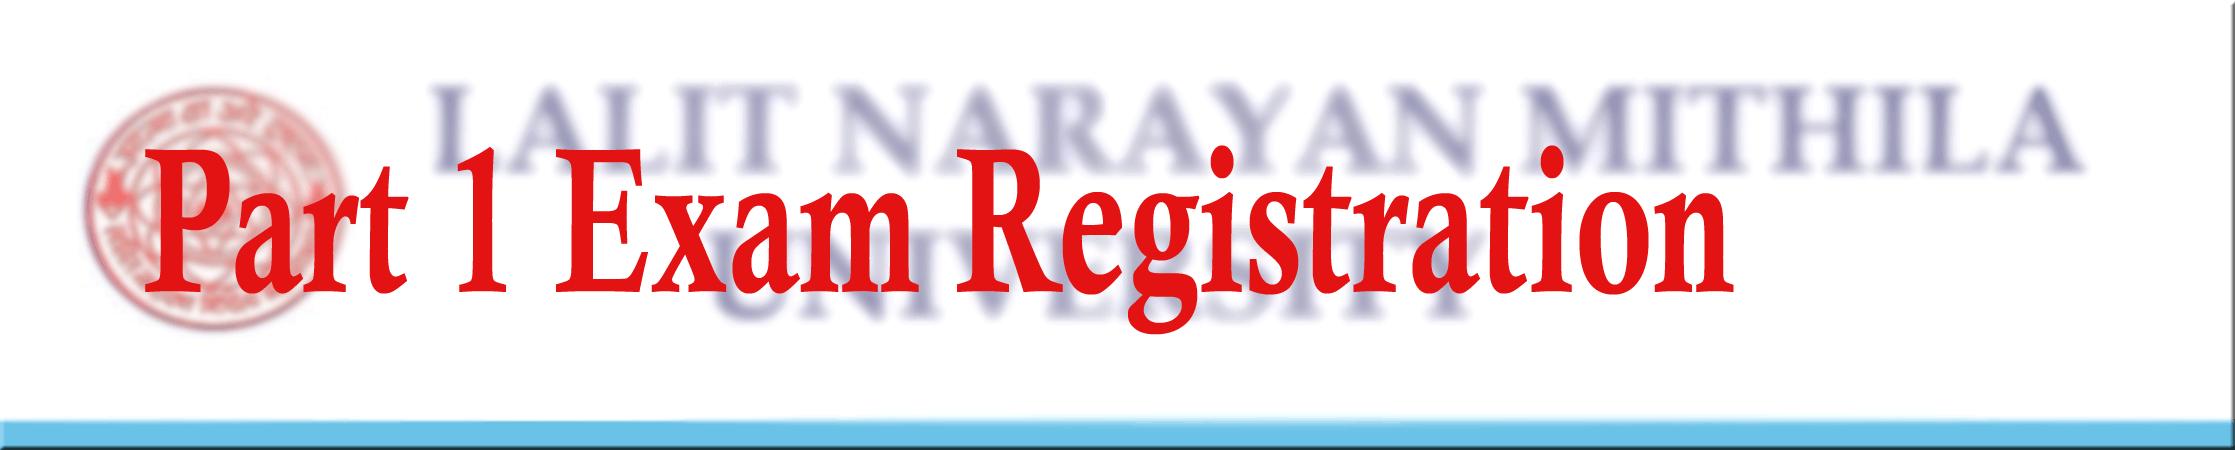 part 1 registration exam, exam part 1 lnmu registration, lnmu part 1 registration website, lnmu exam part 1 registration 2017, exam registration part 1, registration online lnmu website